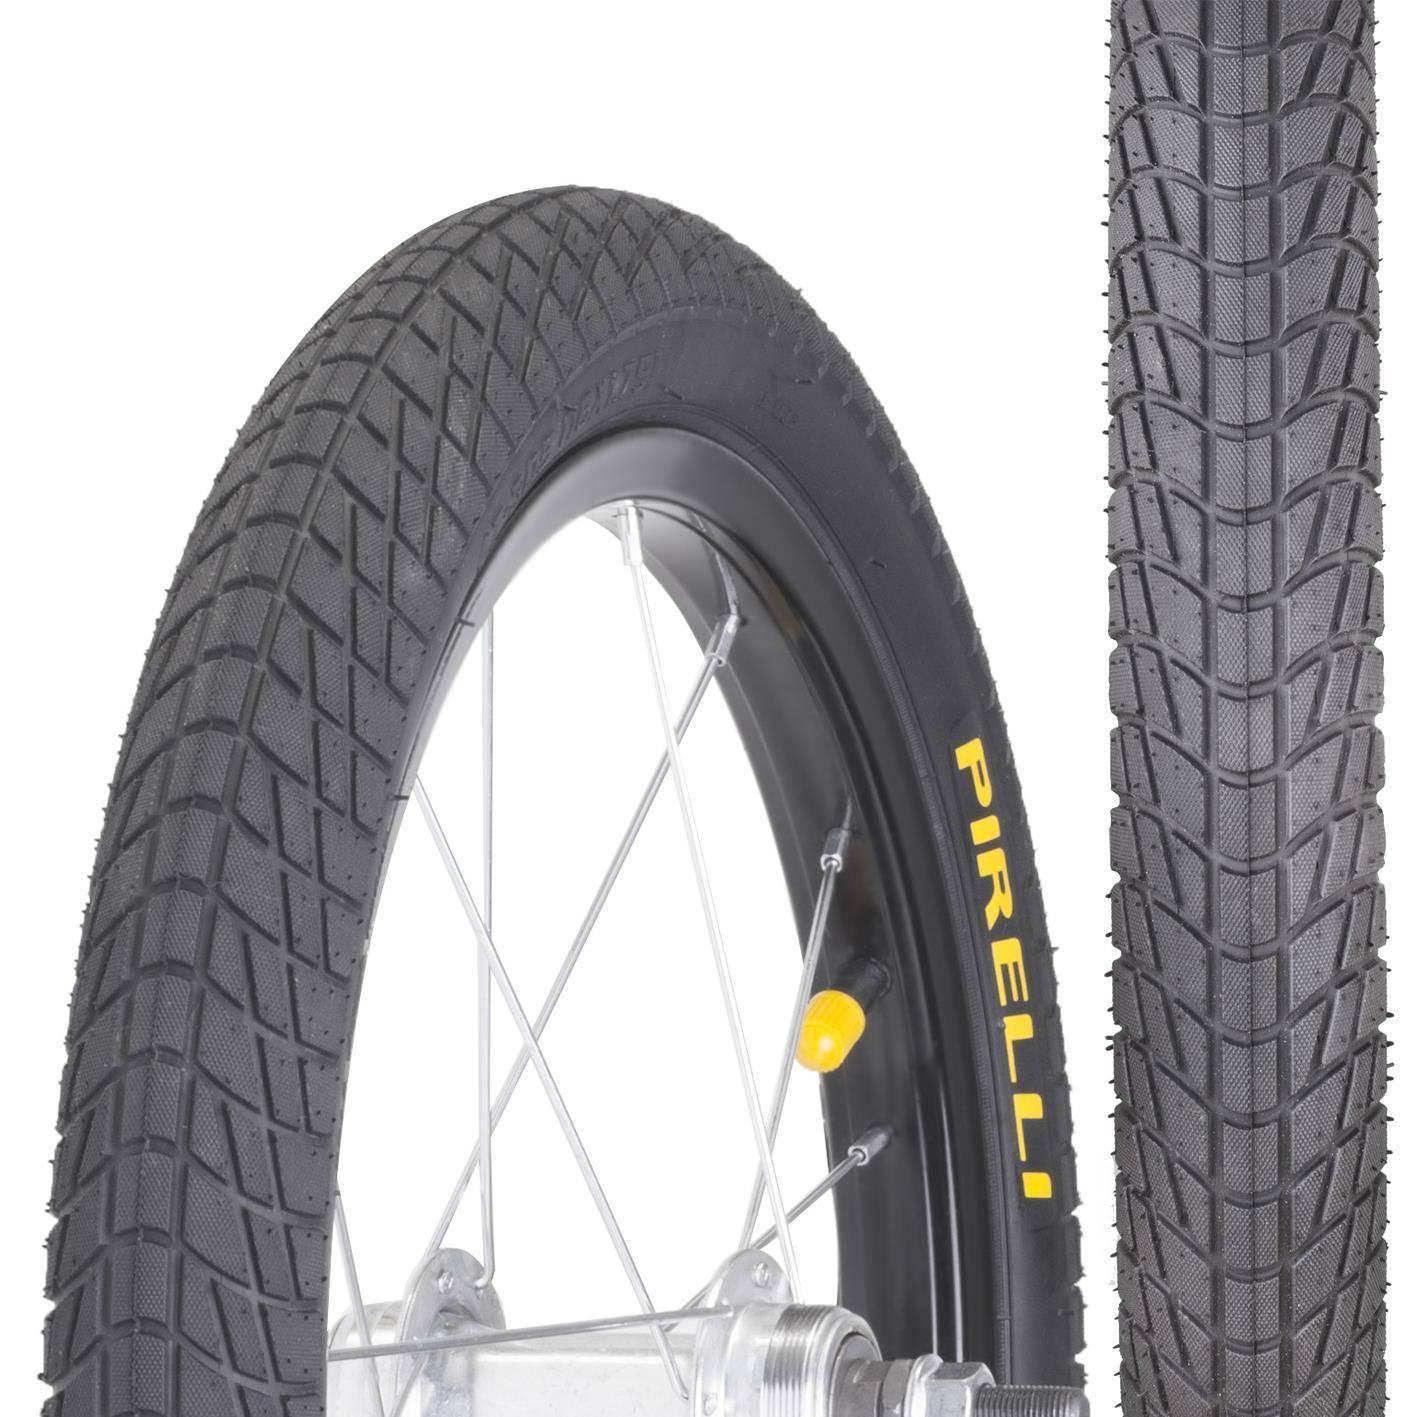 Pneu Pirelli Aro 16 x 1.75 Scuba - BIKE ALLA CARTE